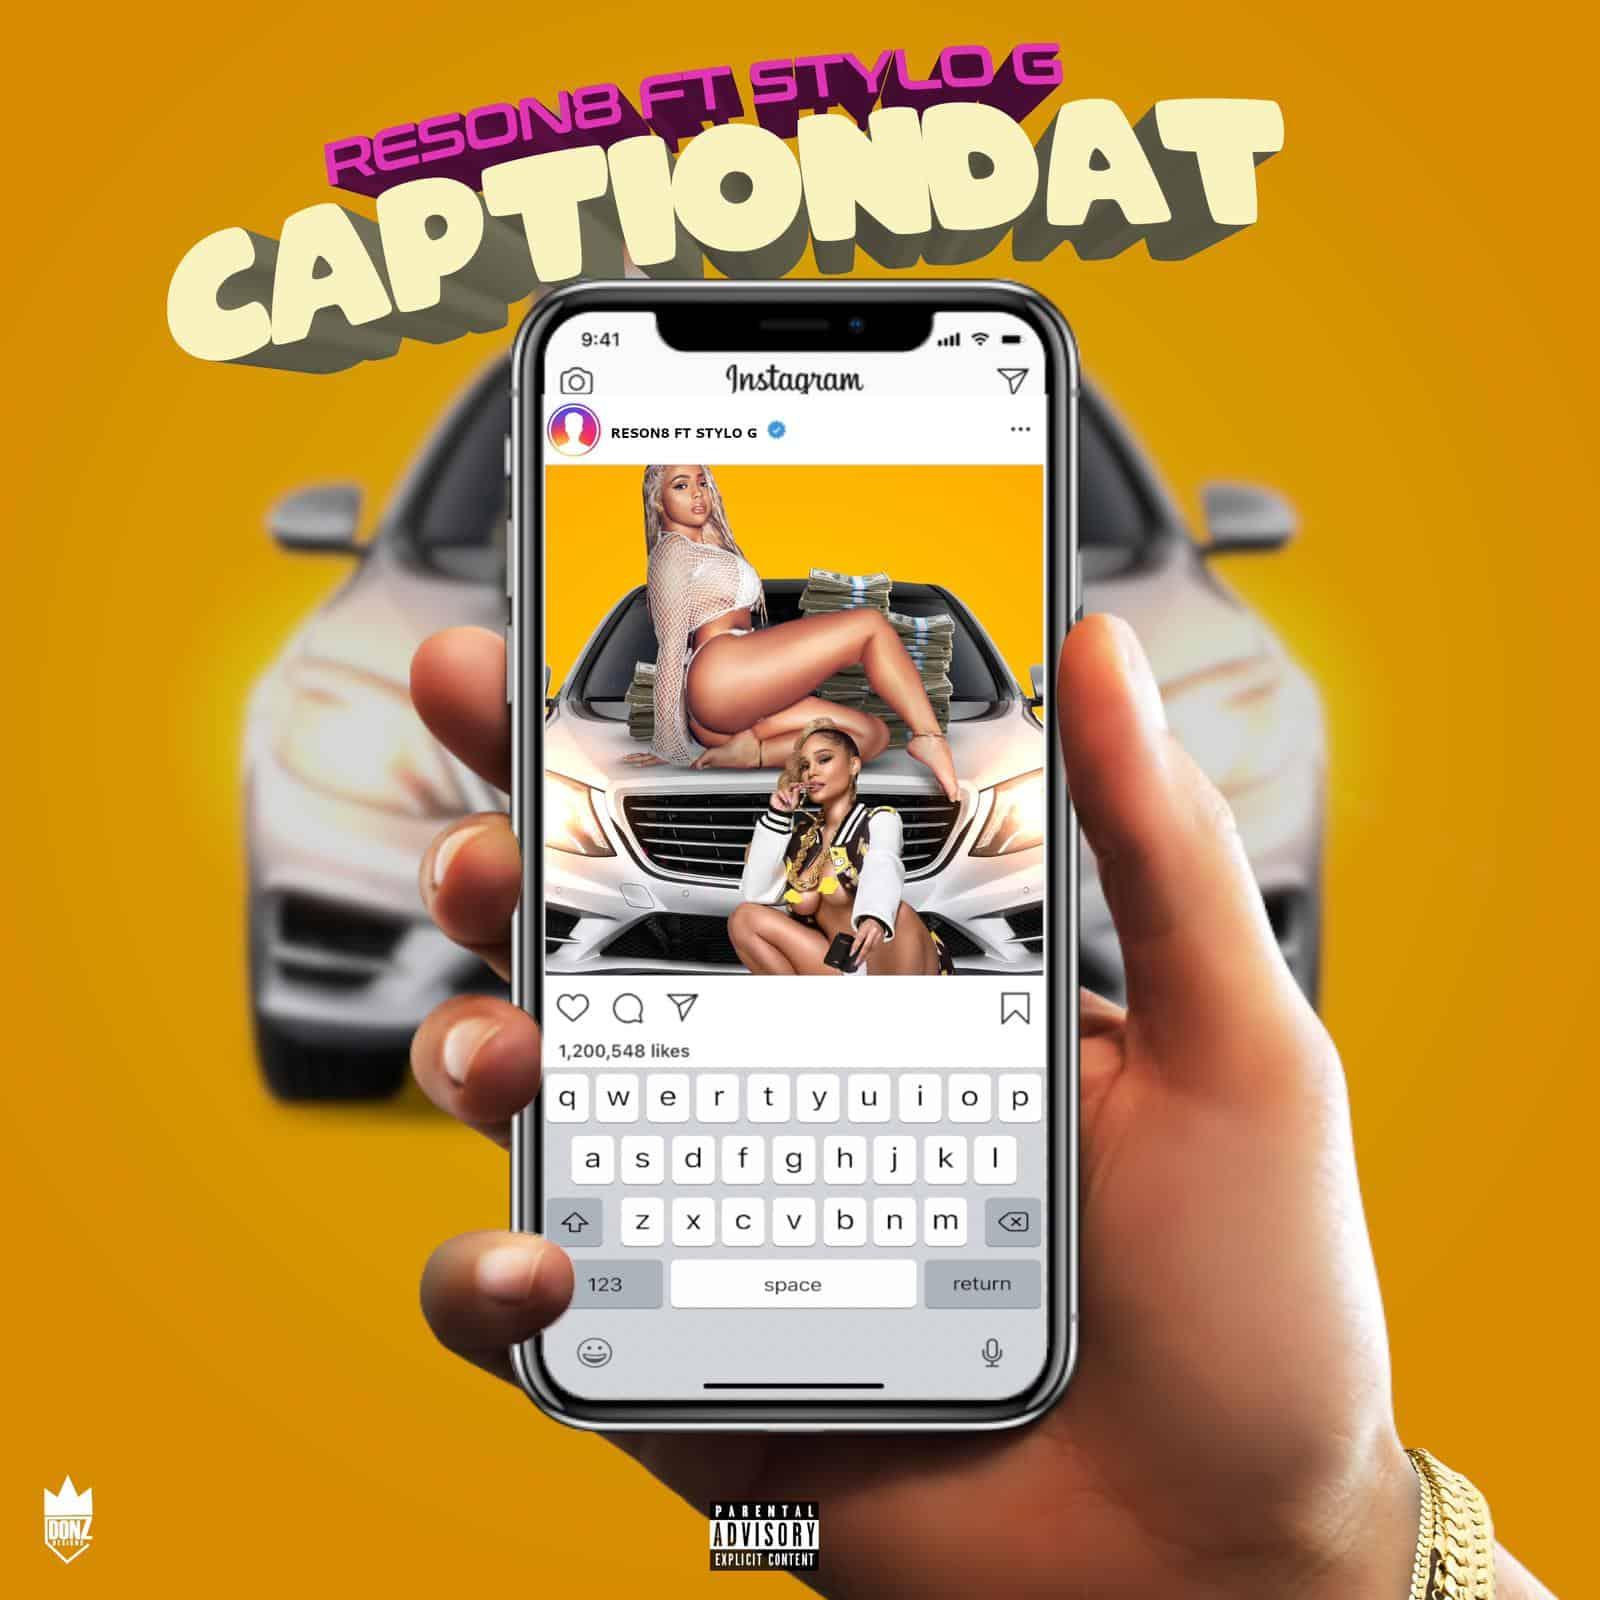 Reson8 - Caption Dat (feat. Stylo G)